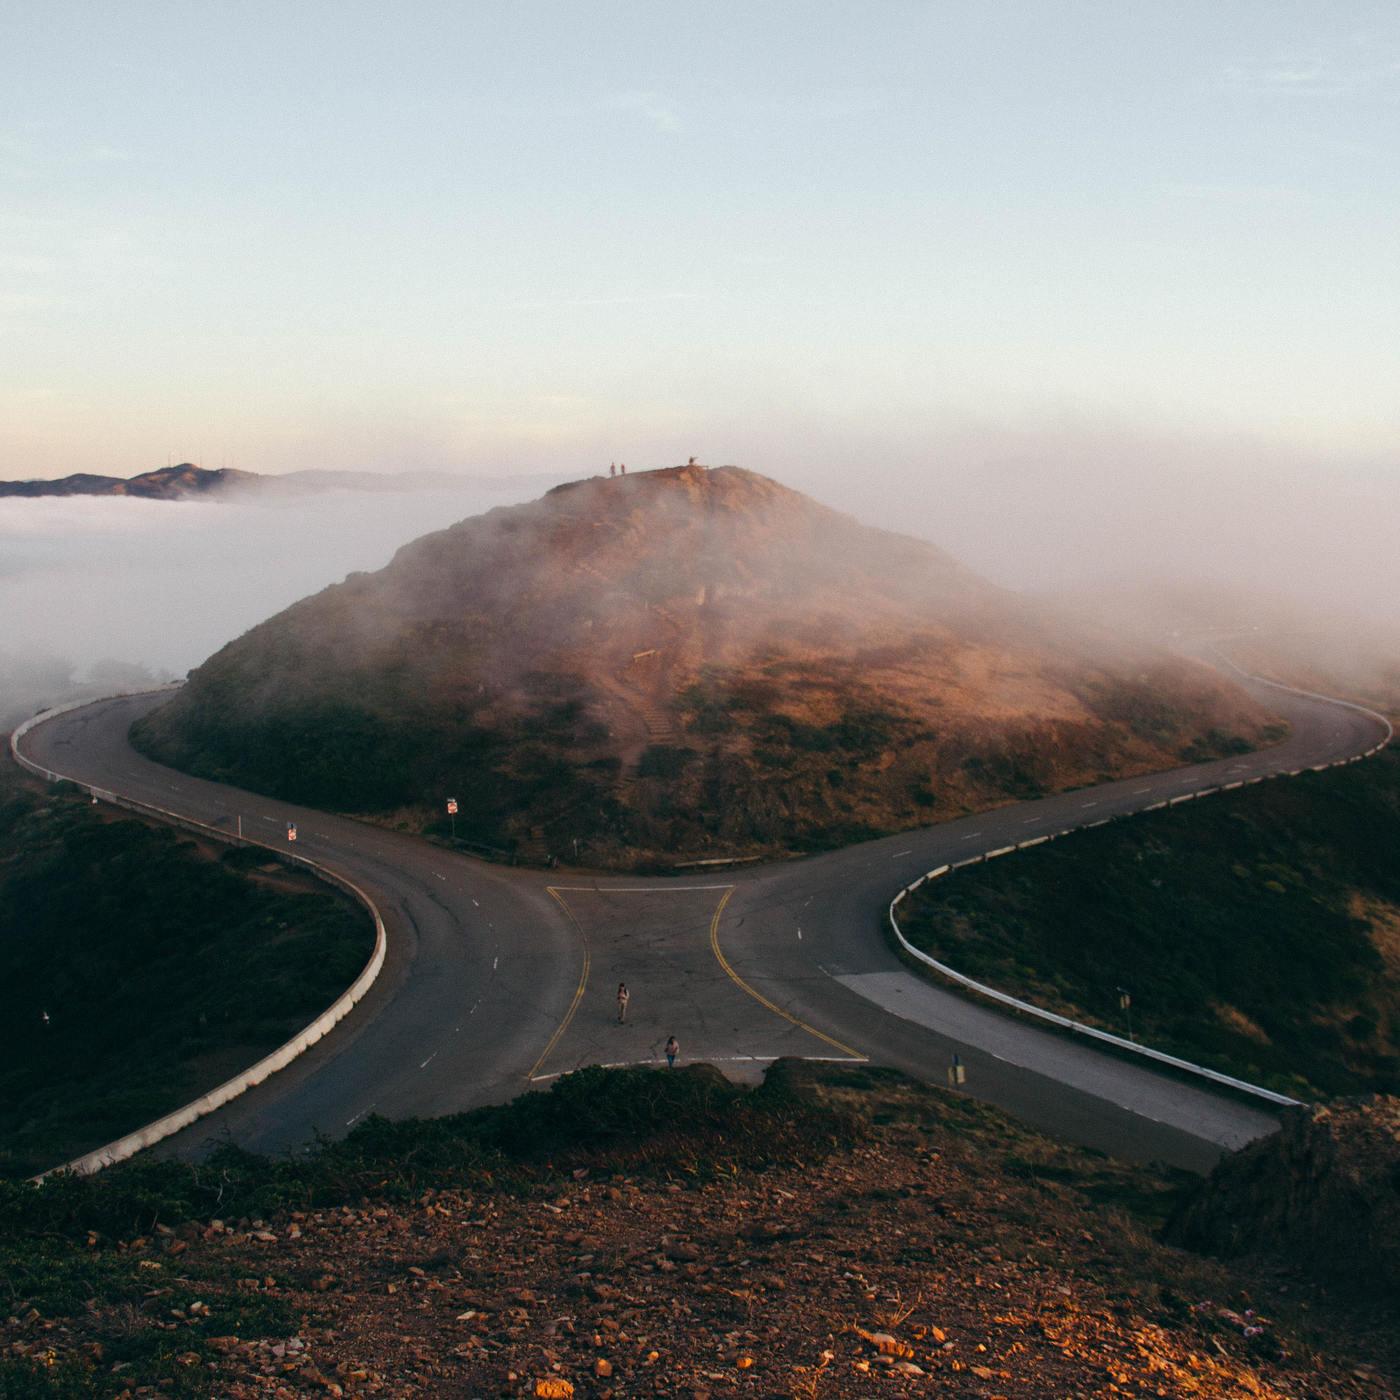 roads merging, outside mountain